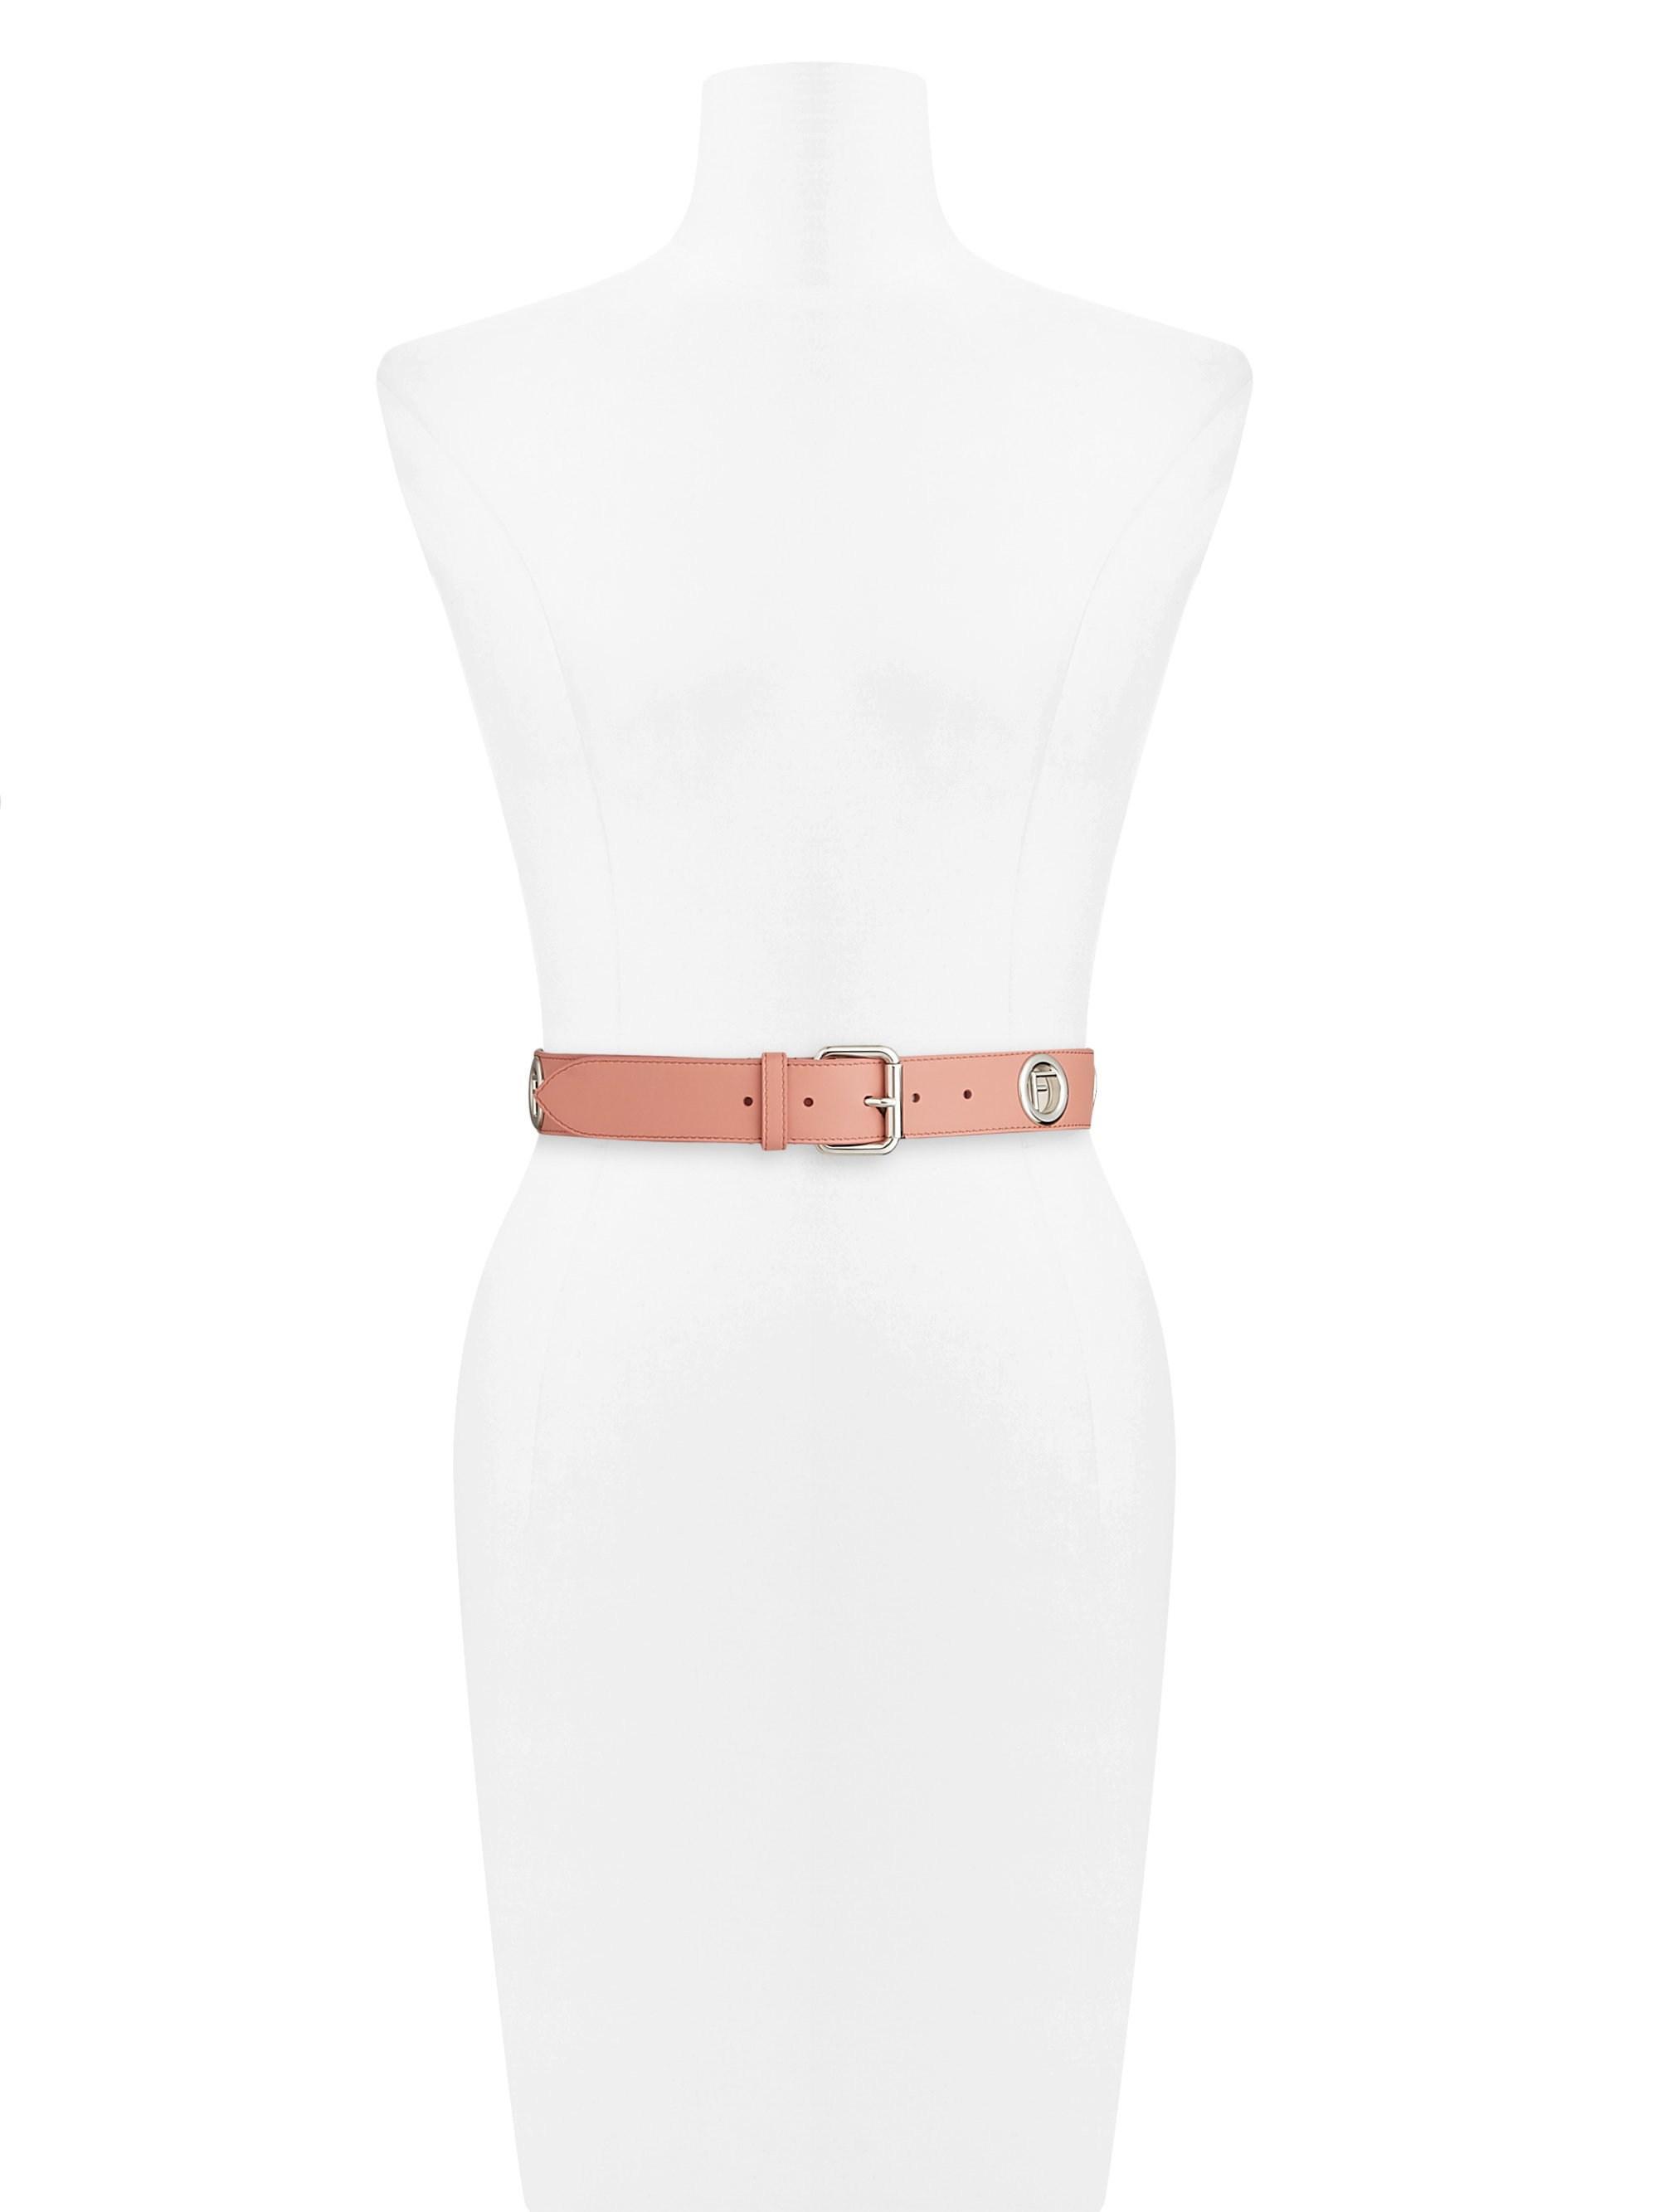 51d0d3d6 Lyst - Fendi Women's Logo Leather Belt - Macaroon - Size Xxs (28